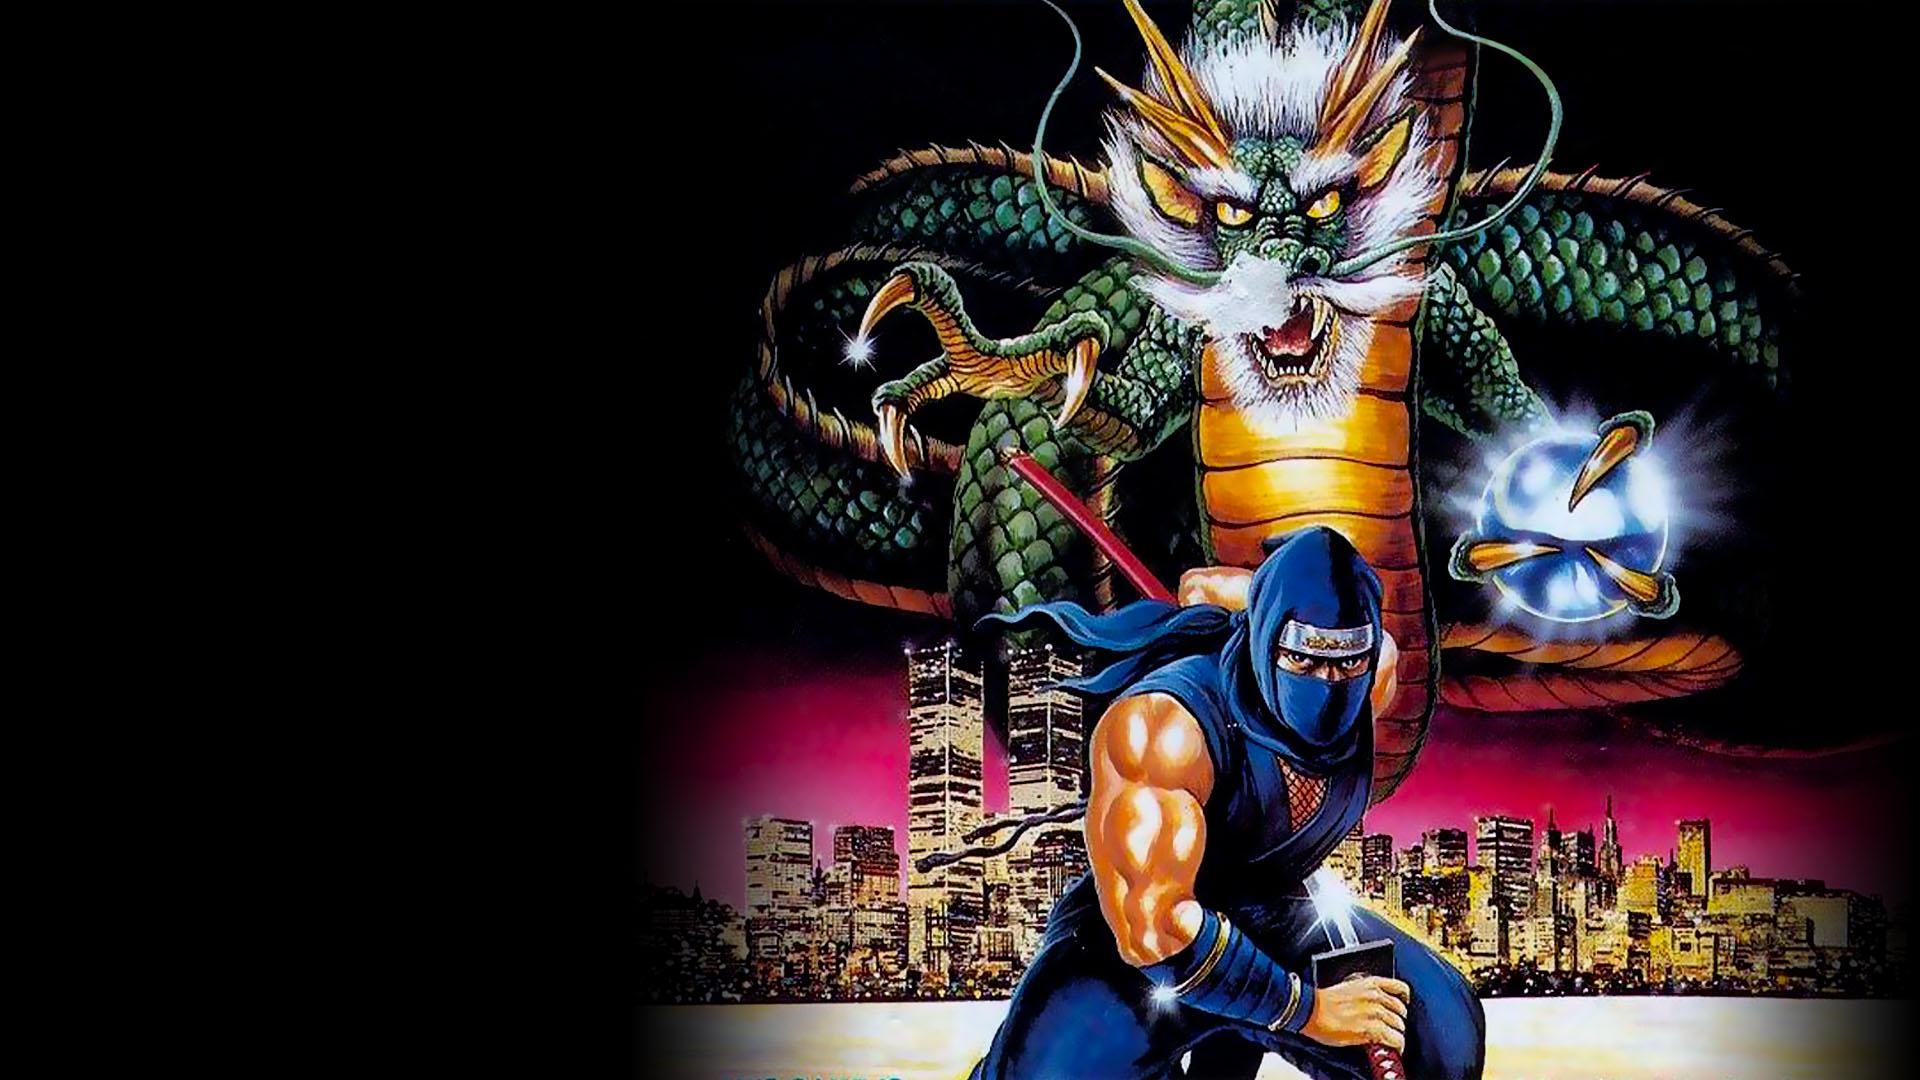 Ninja Gaiden Nes Wallpaper Posted By John Walker